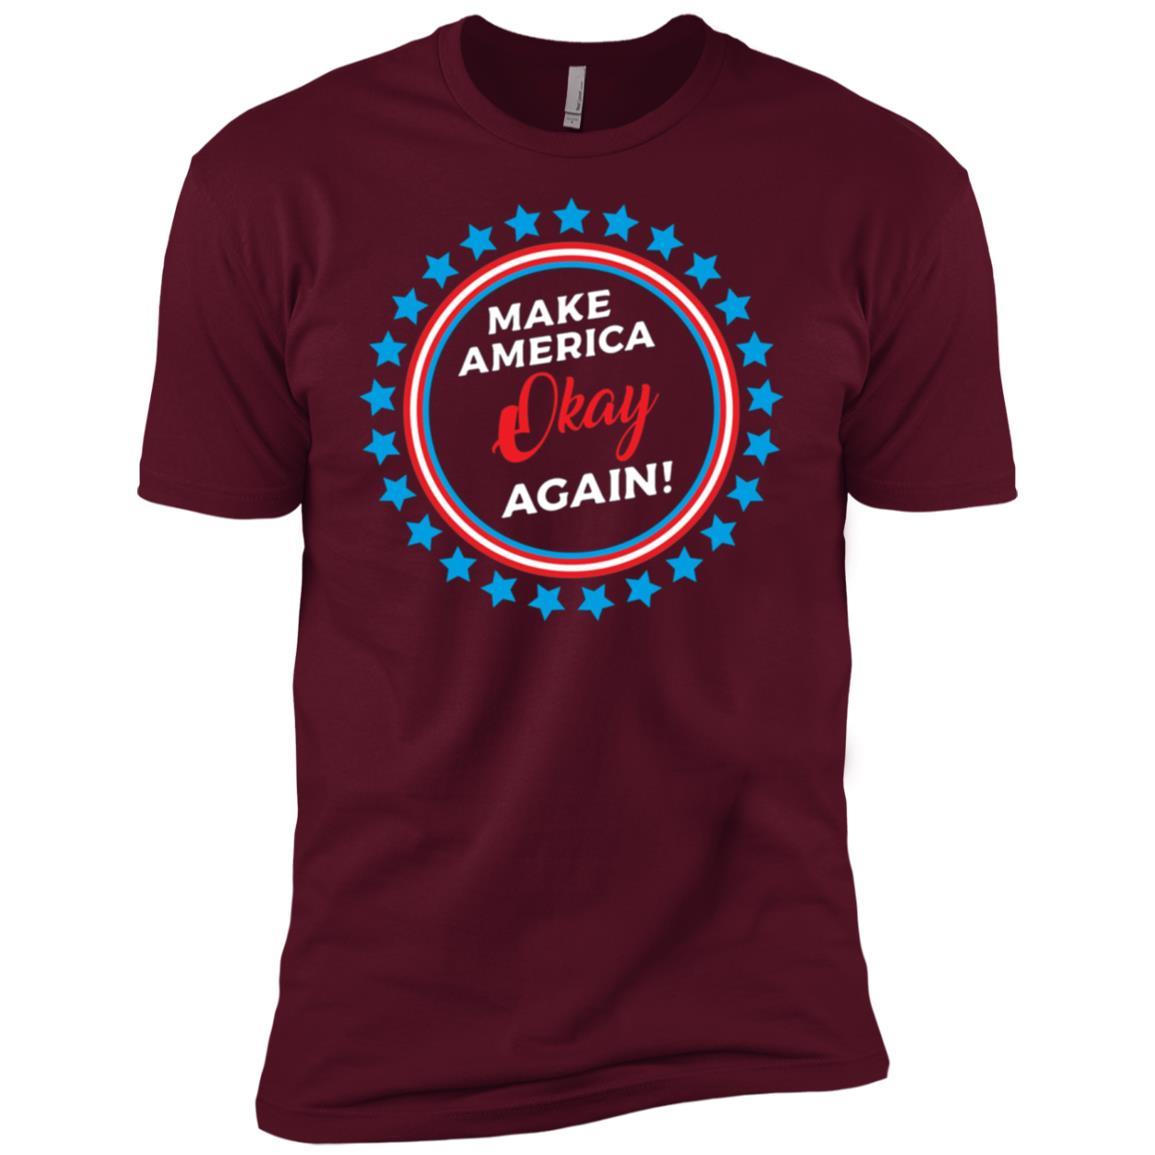 Make America Okay Again, Anti Trump Political Men Short Sleeve T-Shirt